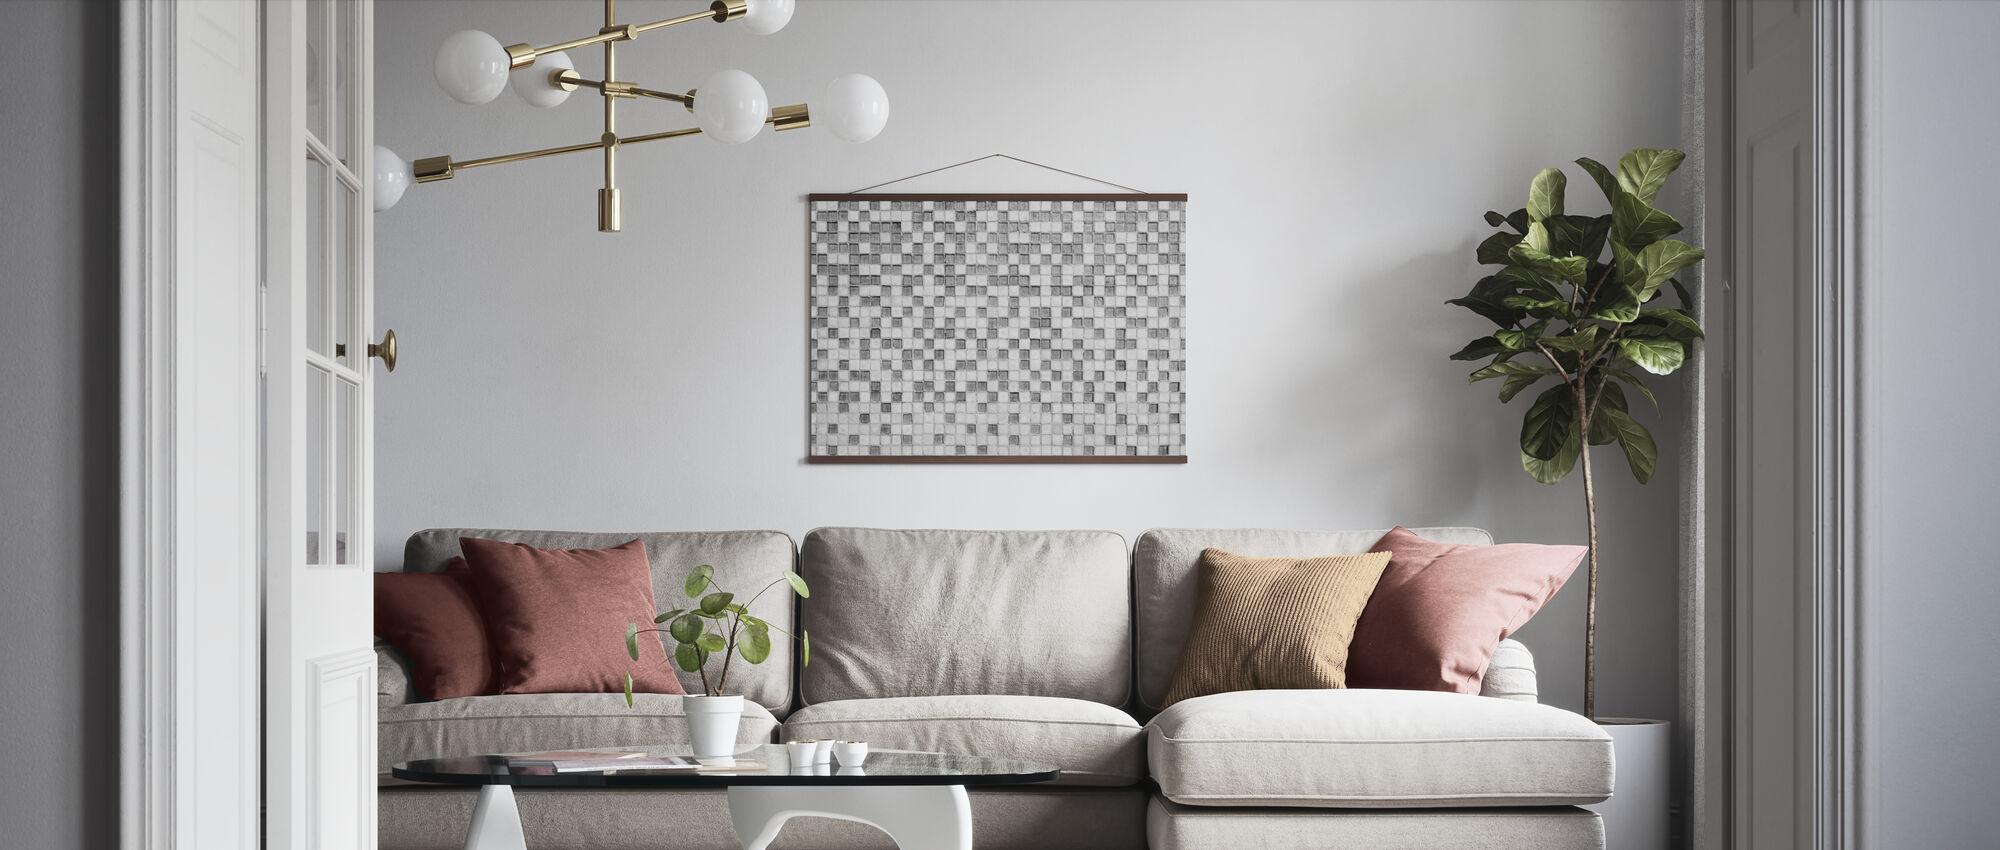 Miami Mosaic Grijs - Poster - Woonkamer